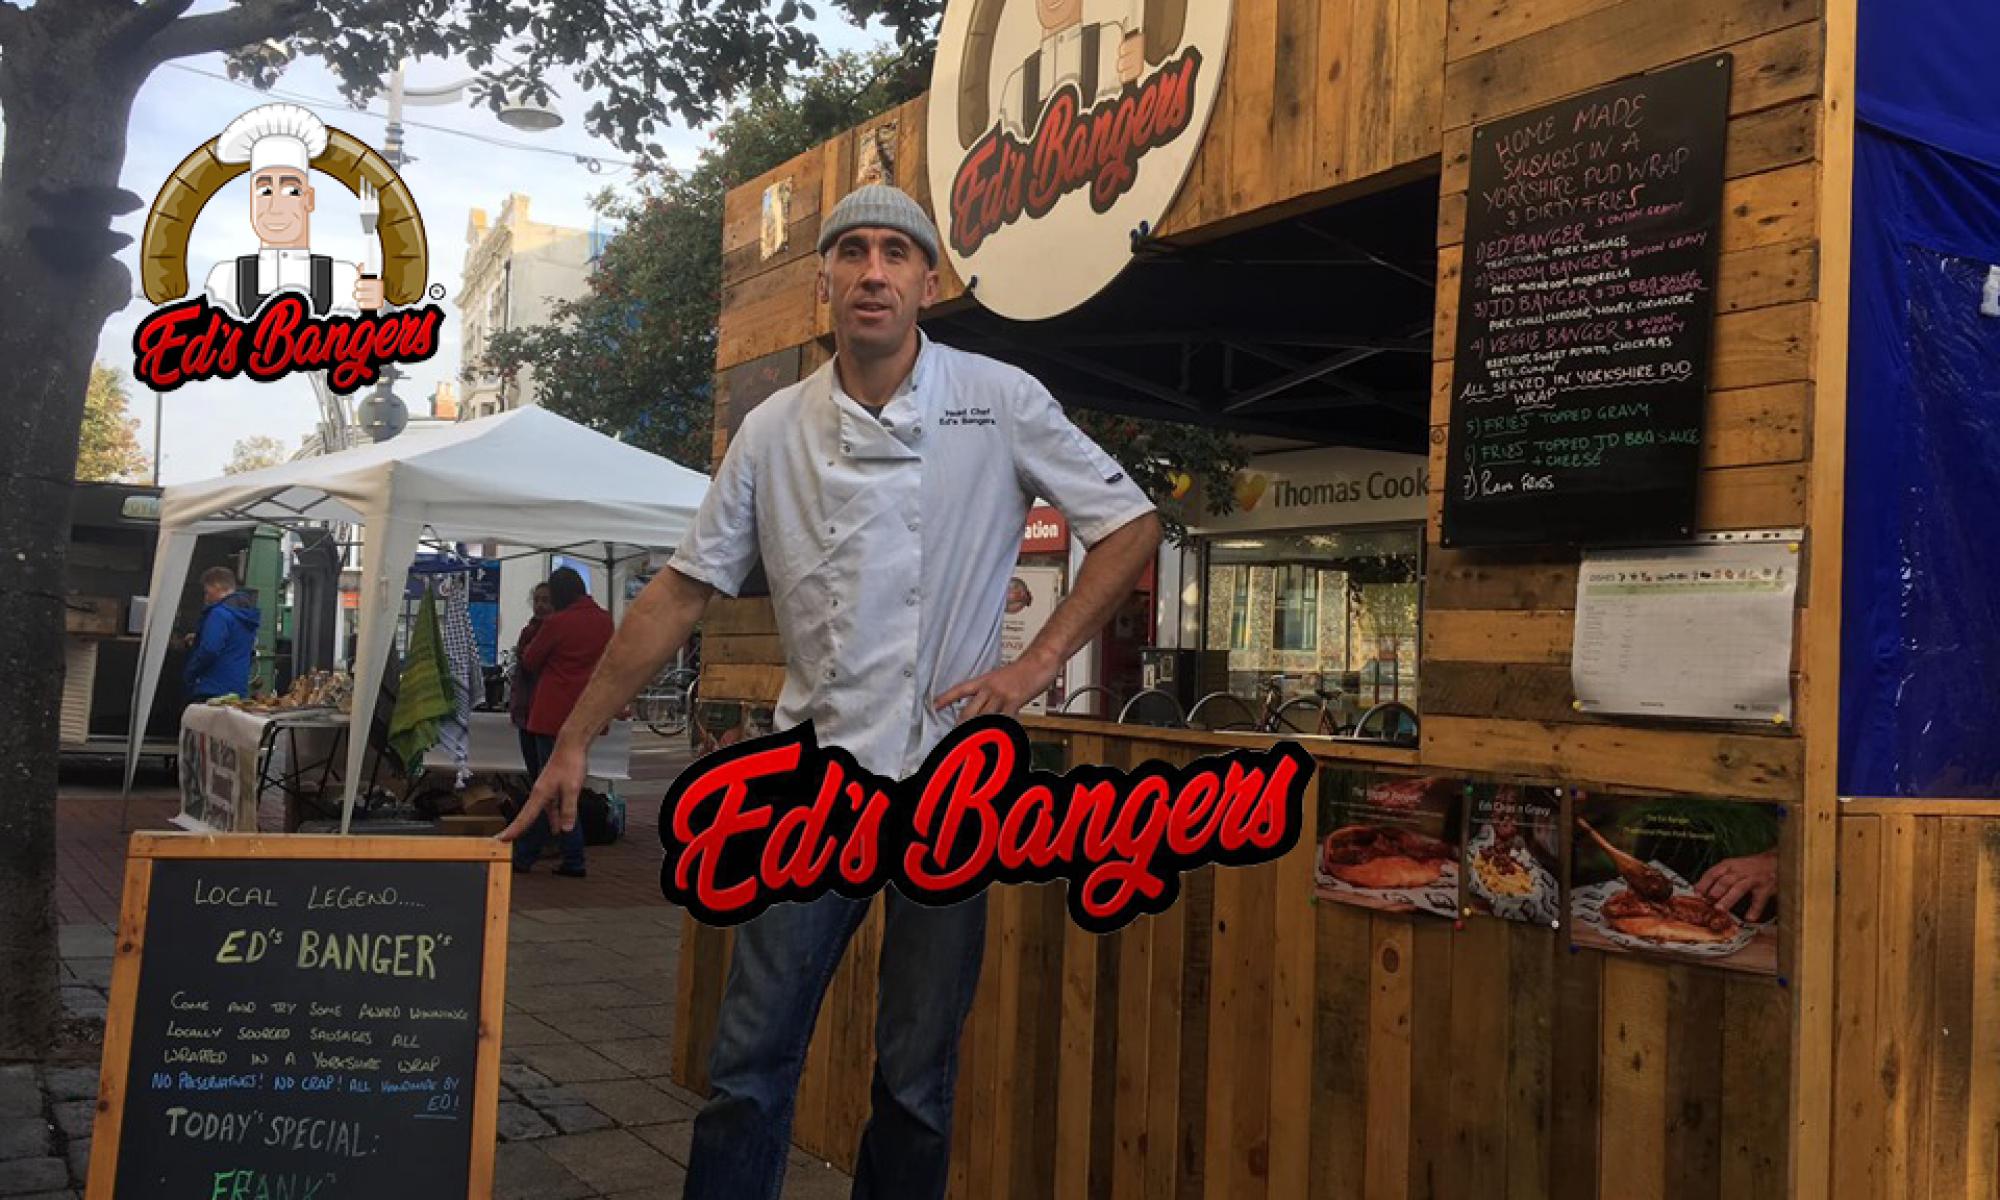 Ed's Bangers